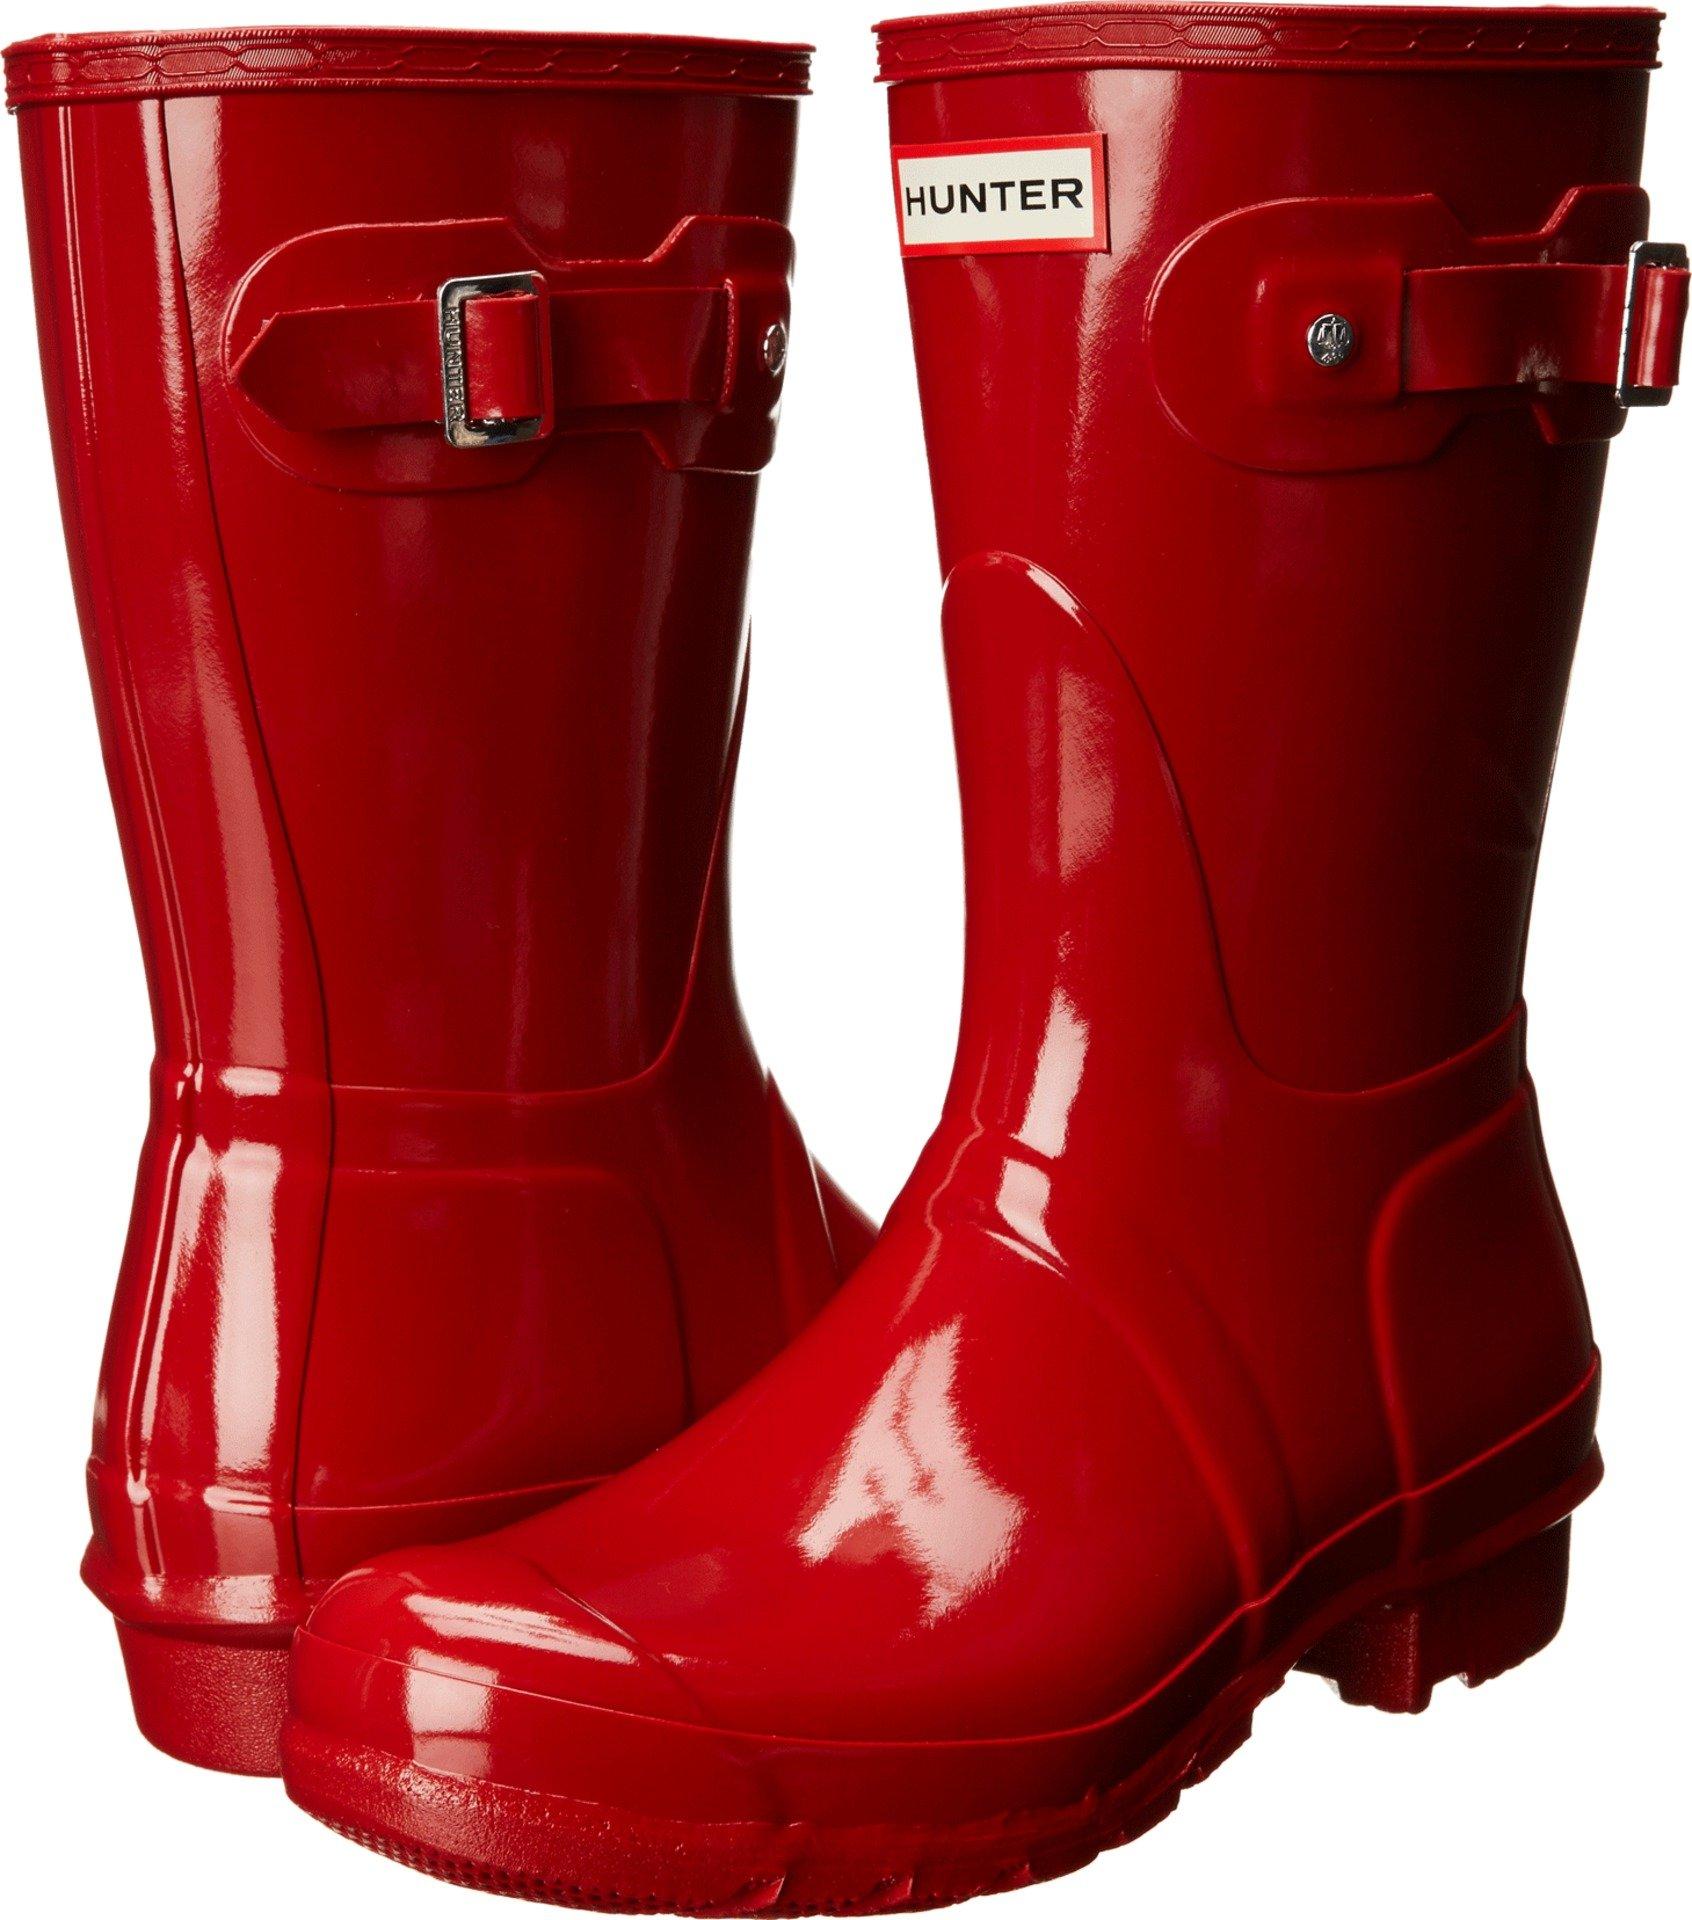 Hunter Women's Original Short Gloss Rain Boots, Military Red, 8 B(M) US by Hunter